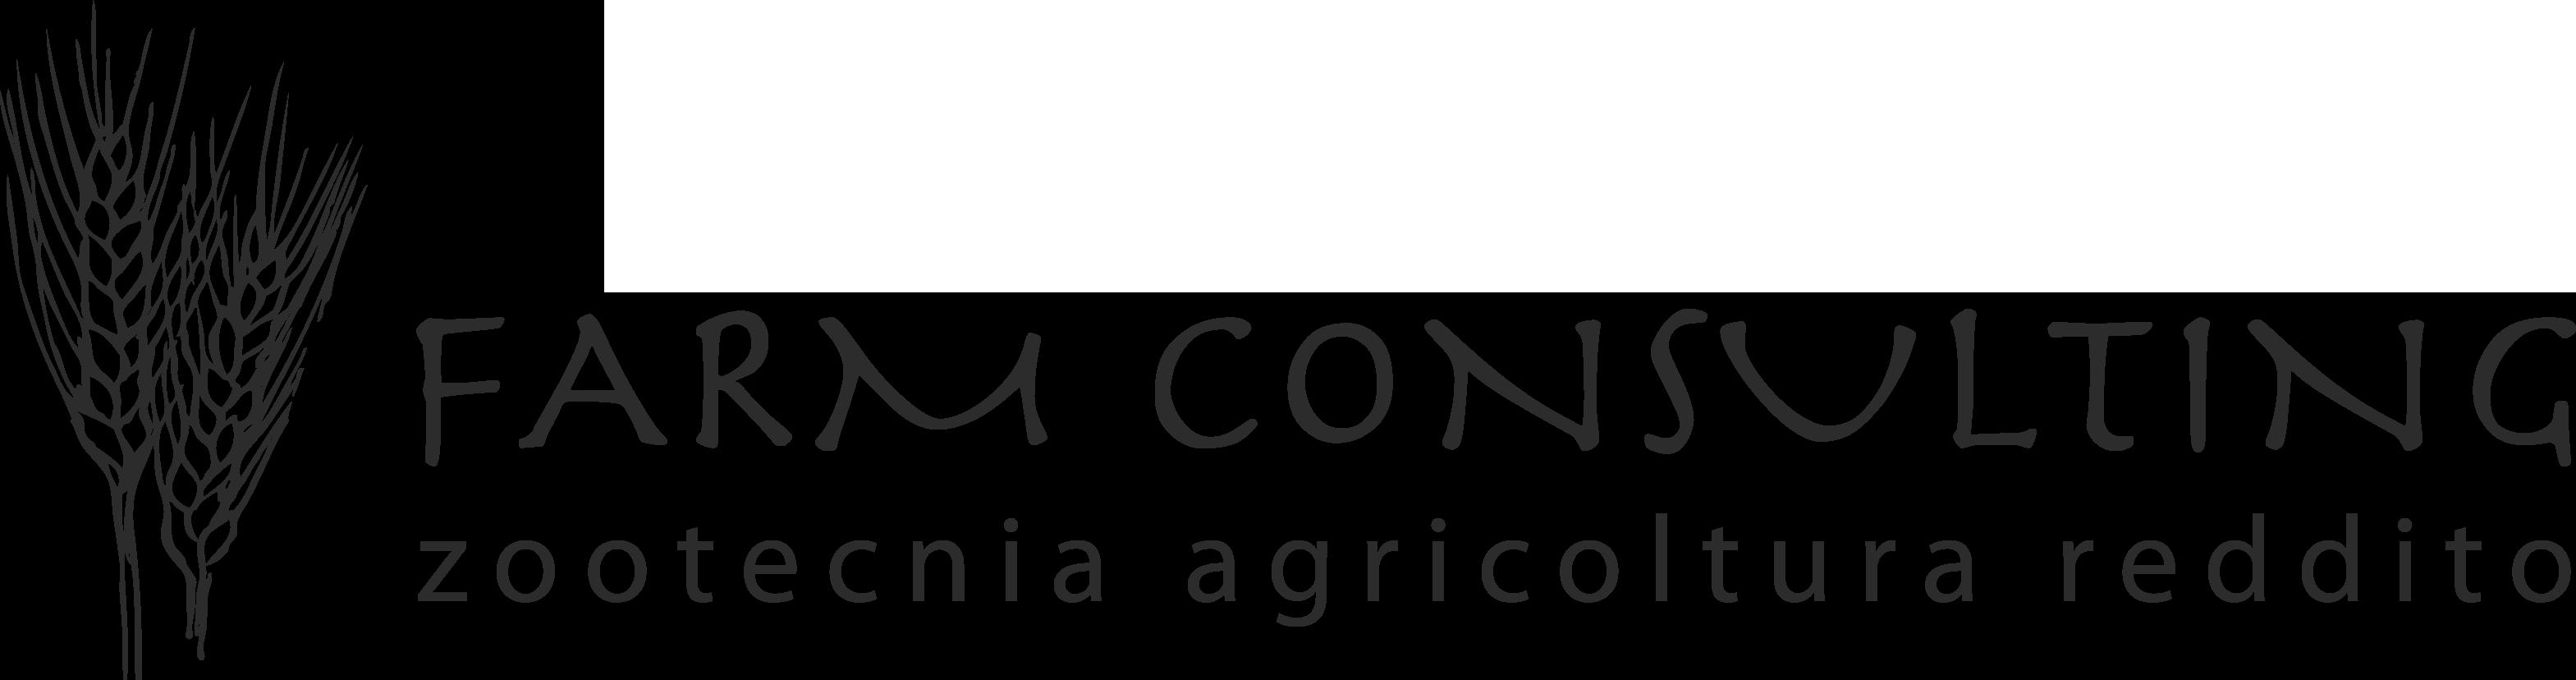 Farm Consulting